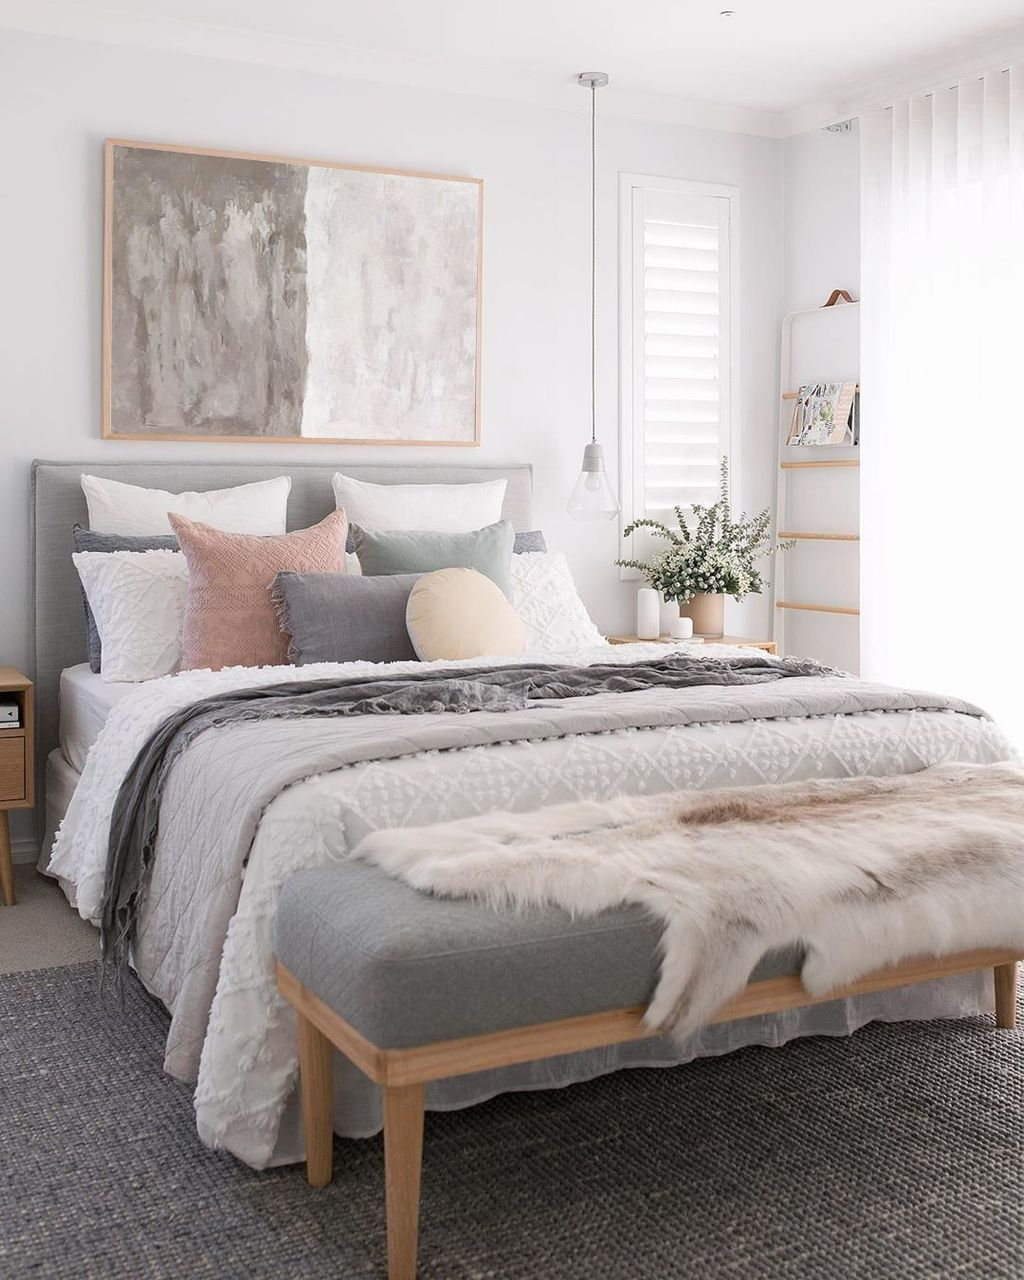 Lovely Spring Bedroom Decor Ideas Trending This Year 02